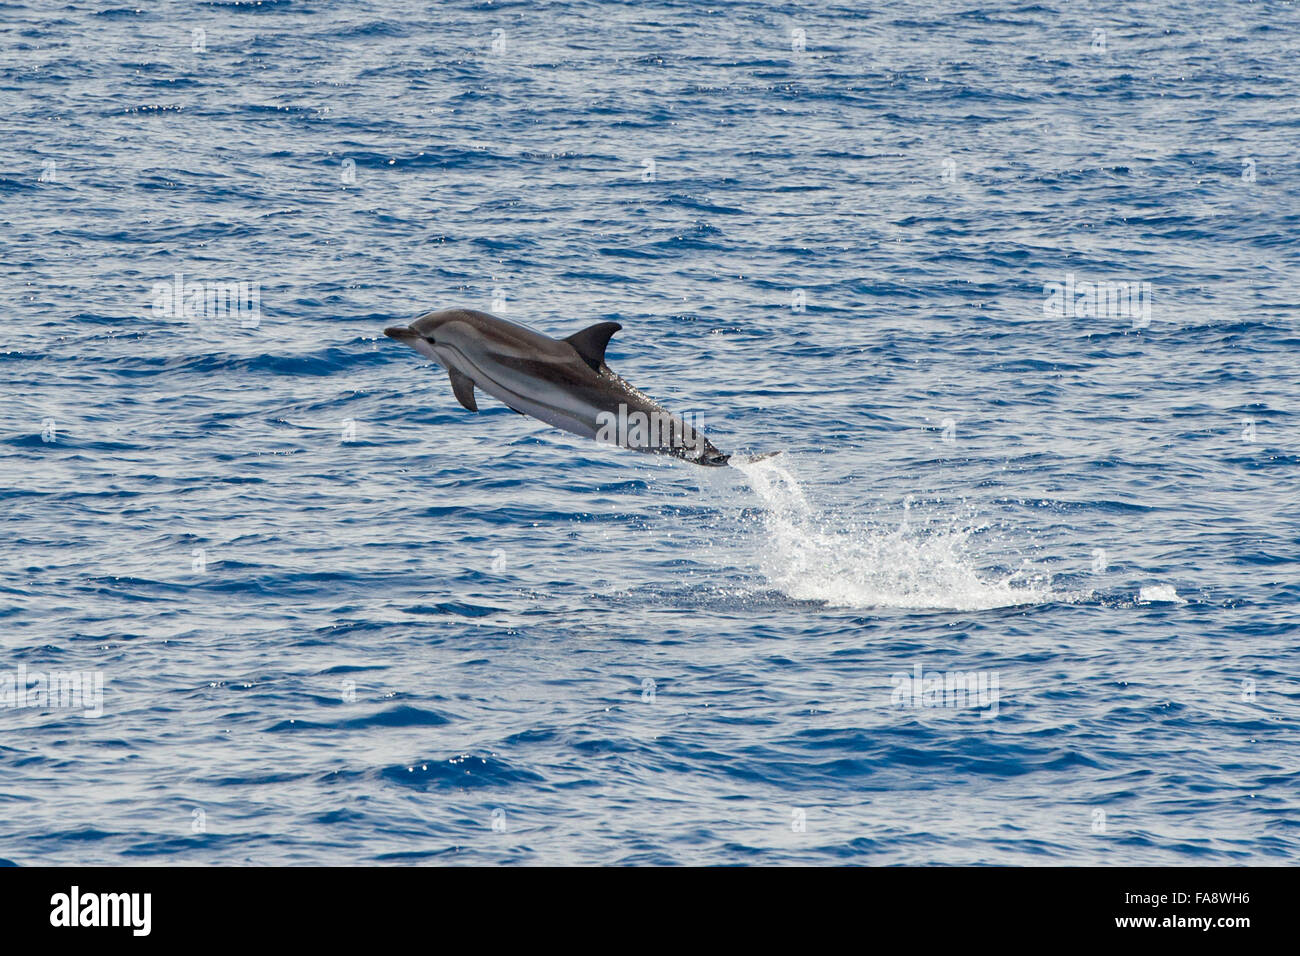 Striped Dolphin, Stenella coeruleoalba, breaching high in the air, Azores, Atlantic Ocean. - Stock Image